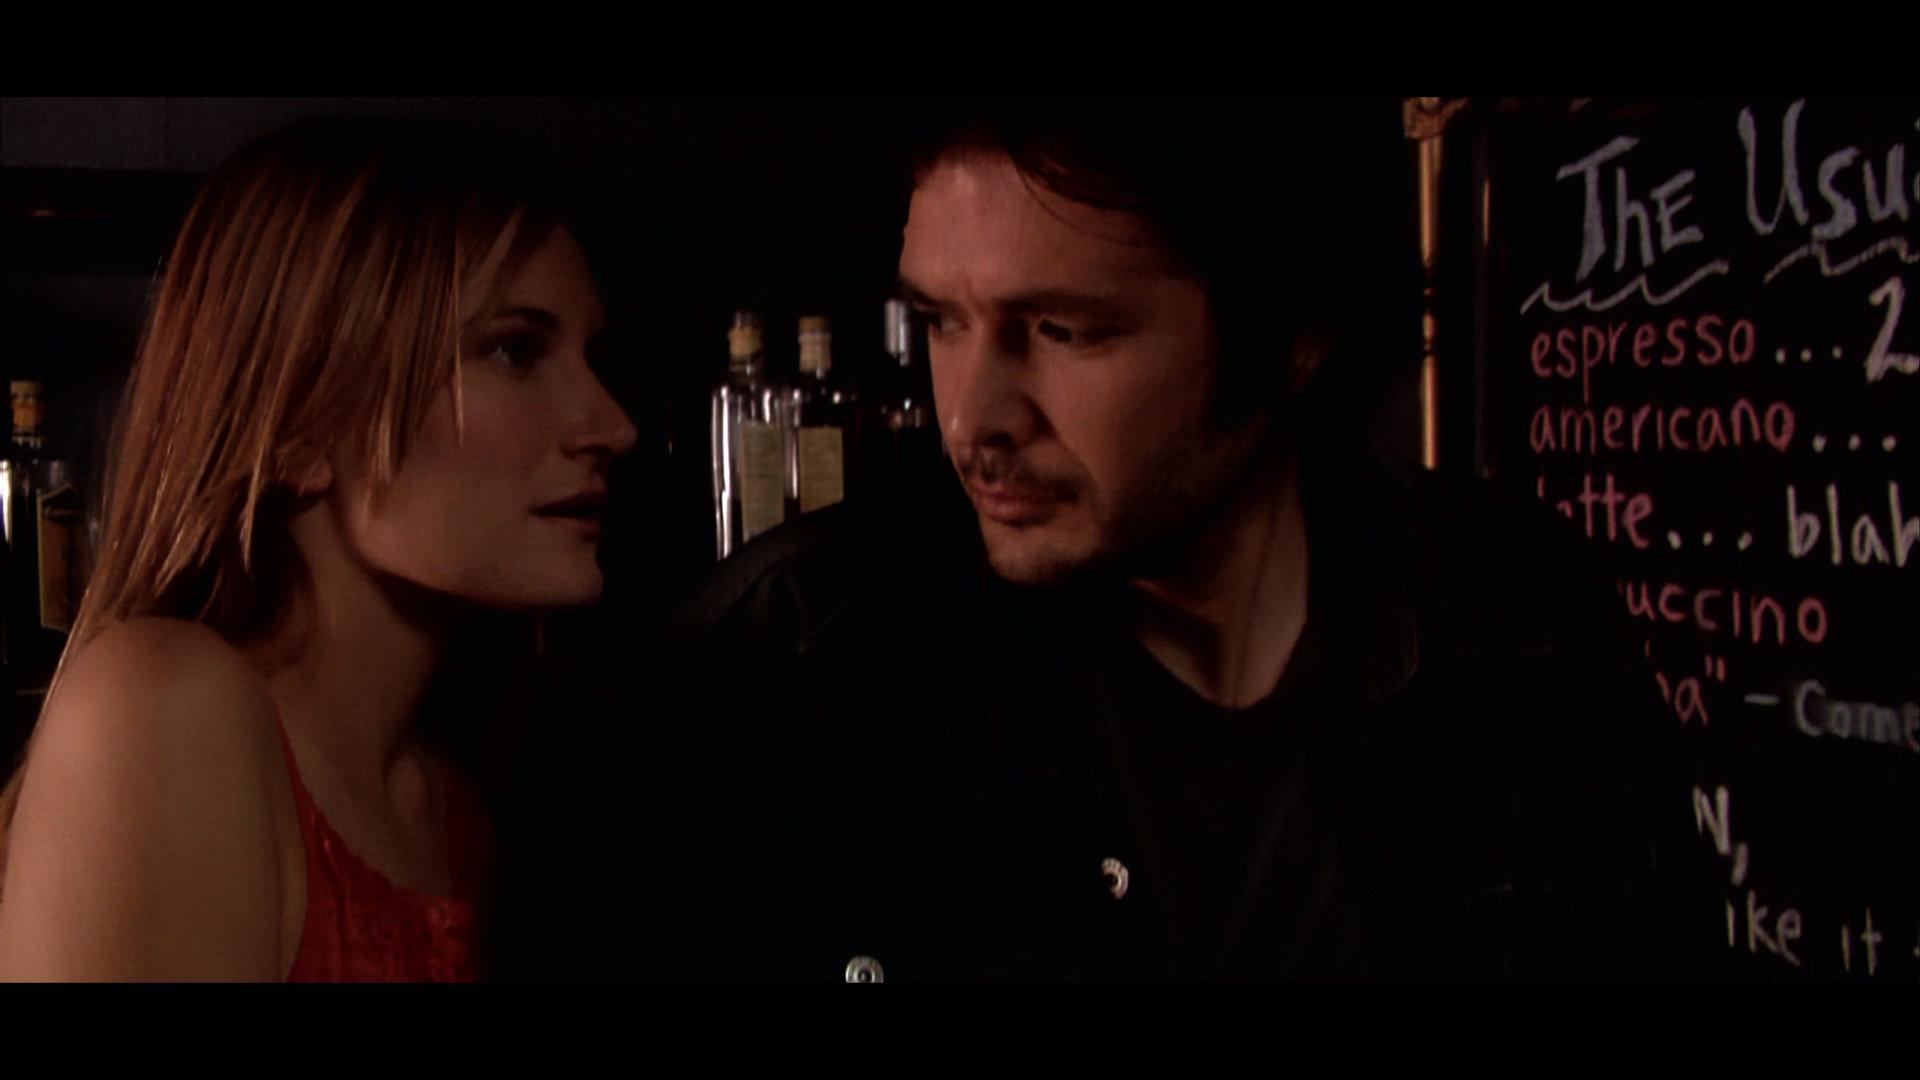 Kym Jackson and Mark E. Fletcher in The Best Sex (2009)